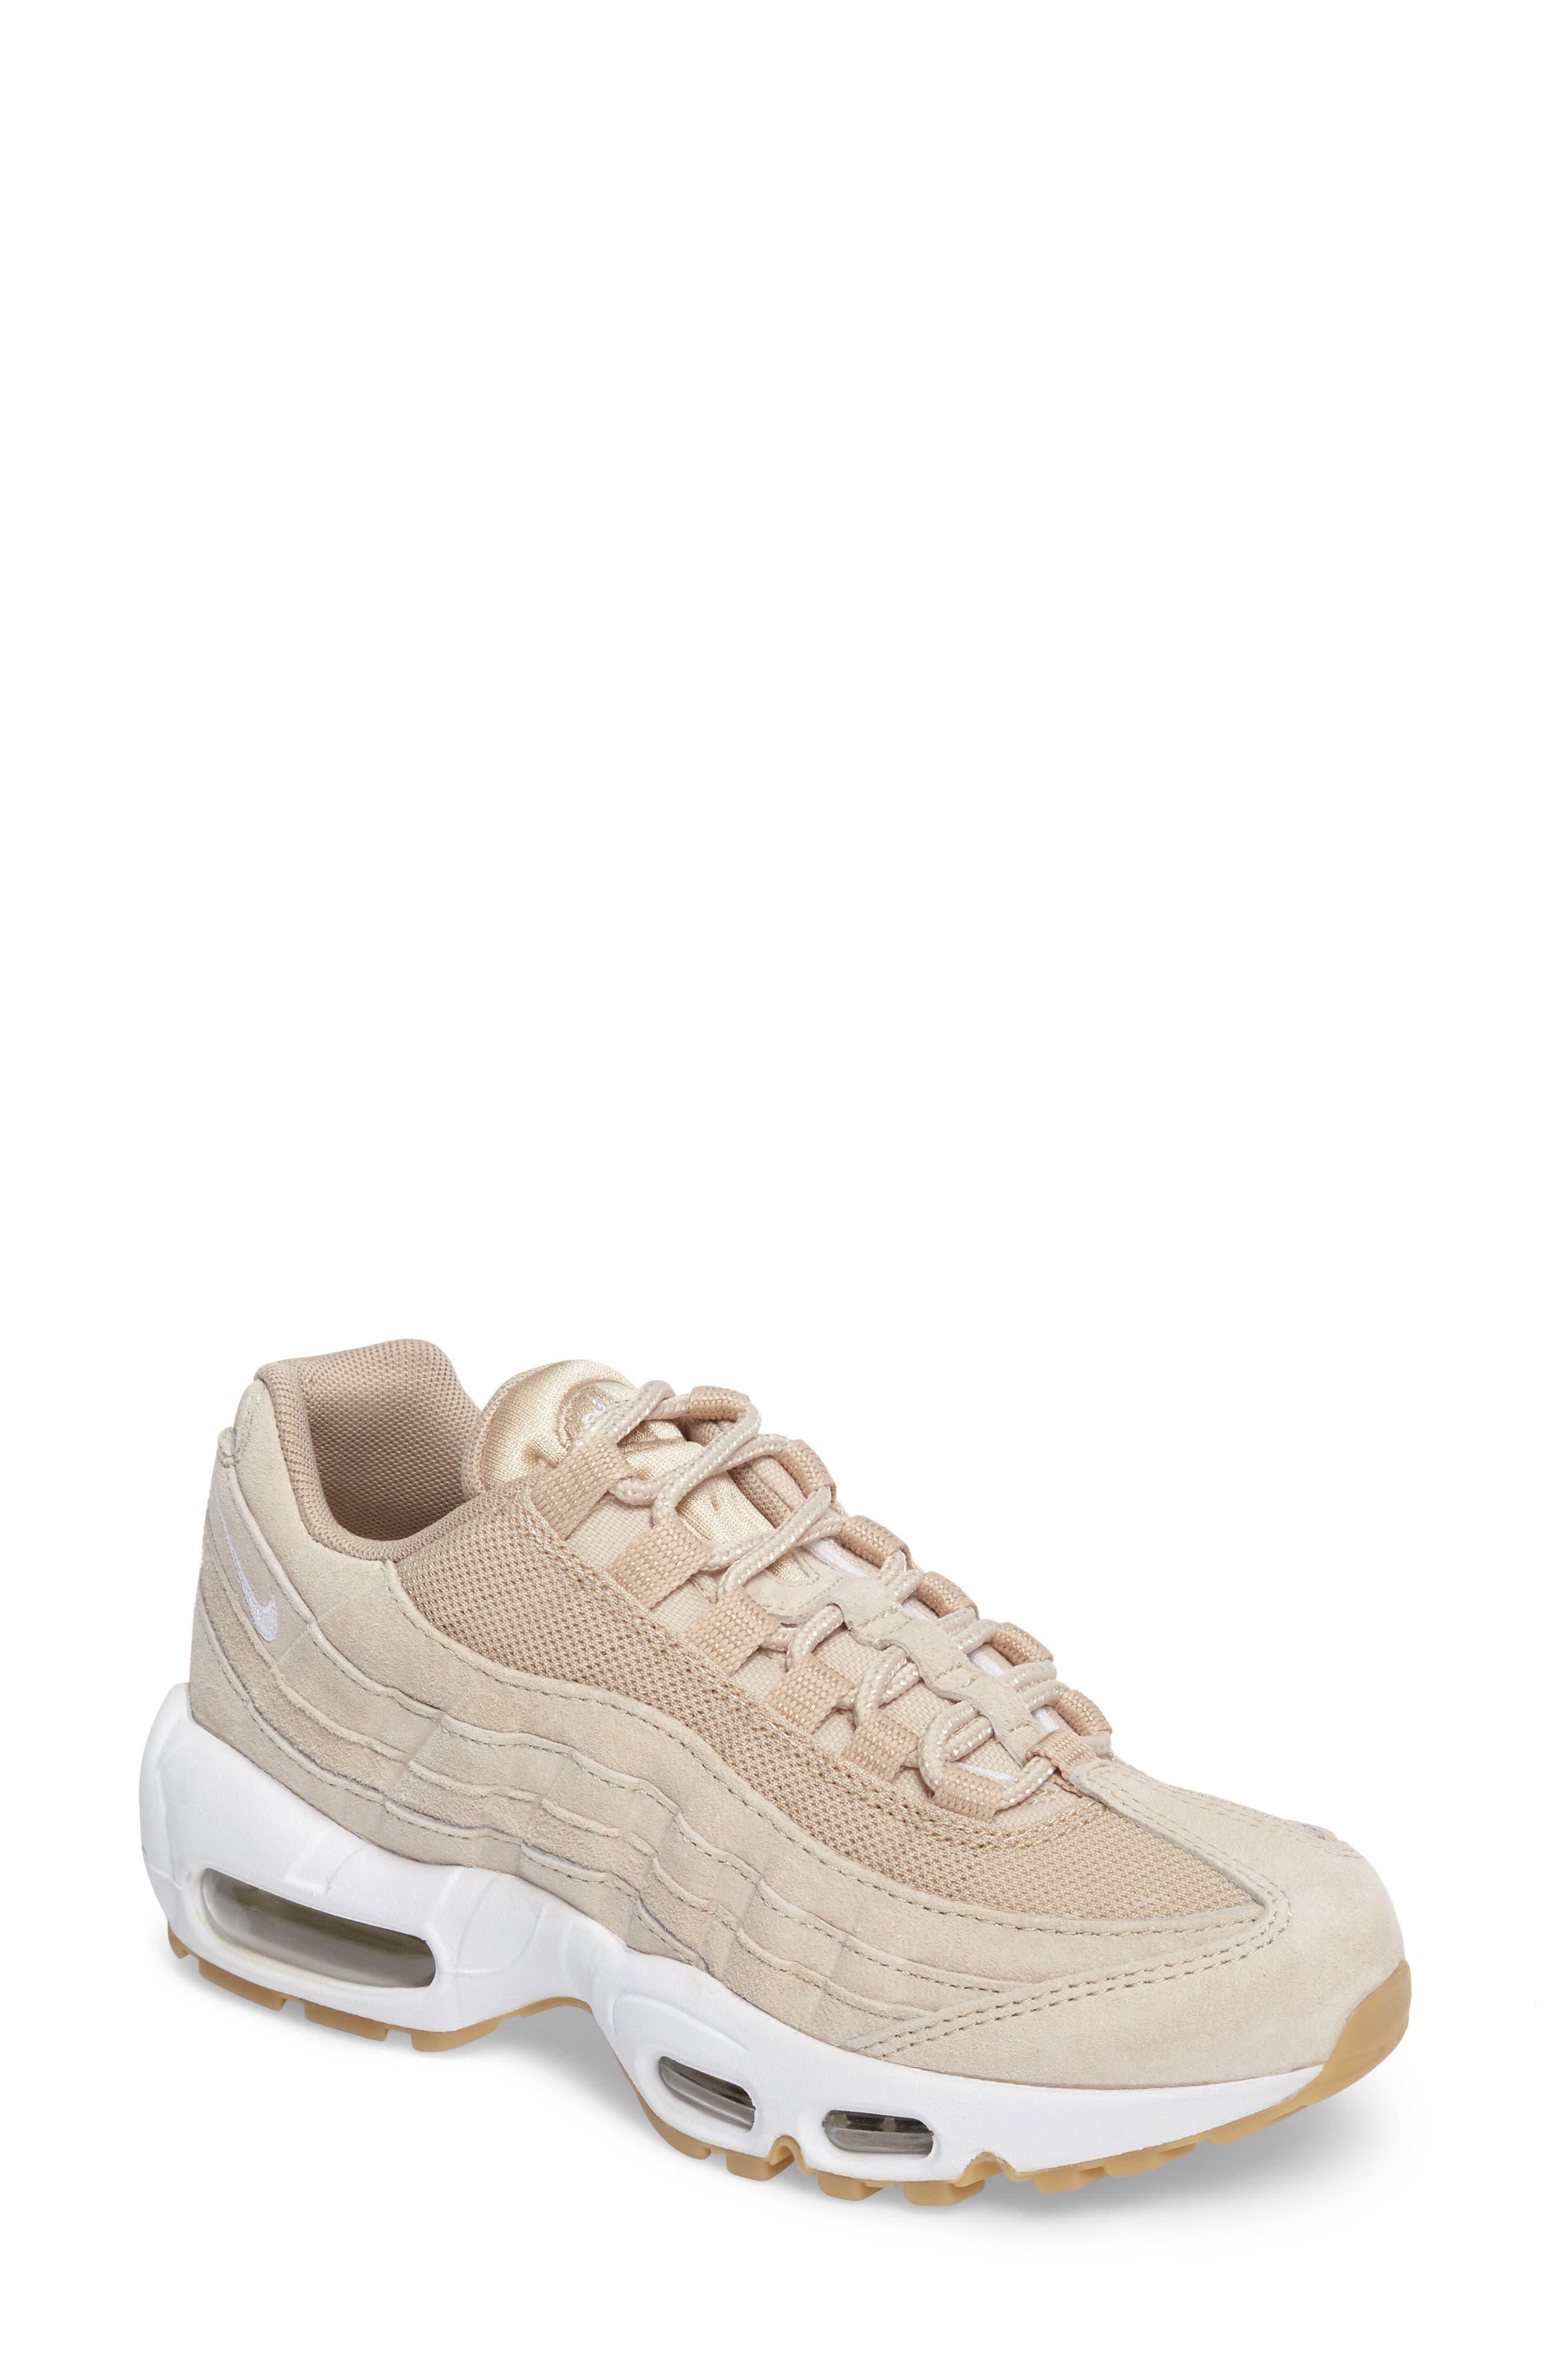 Air Max 95 SD Sneaker,                         Main,                         color, Oatmeal/ White